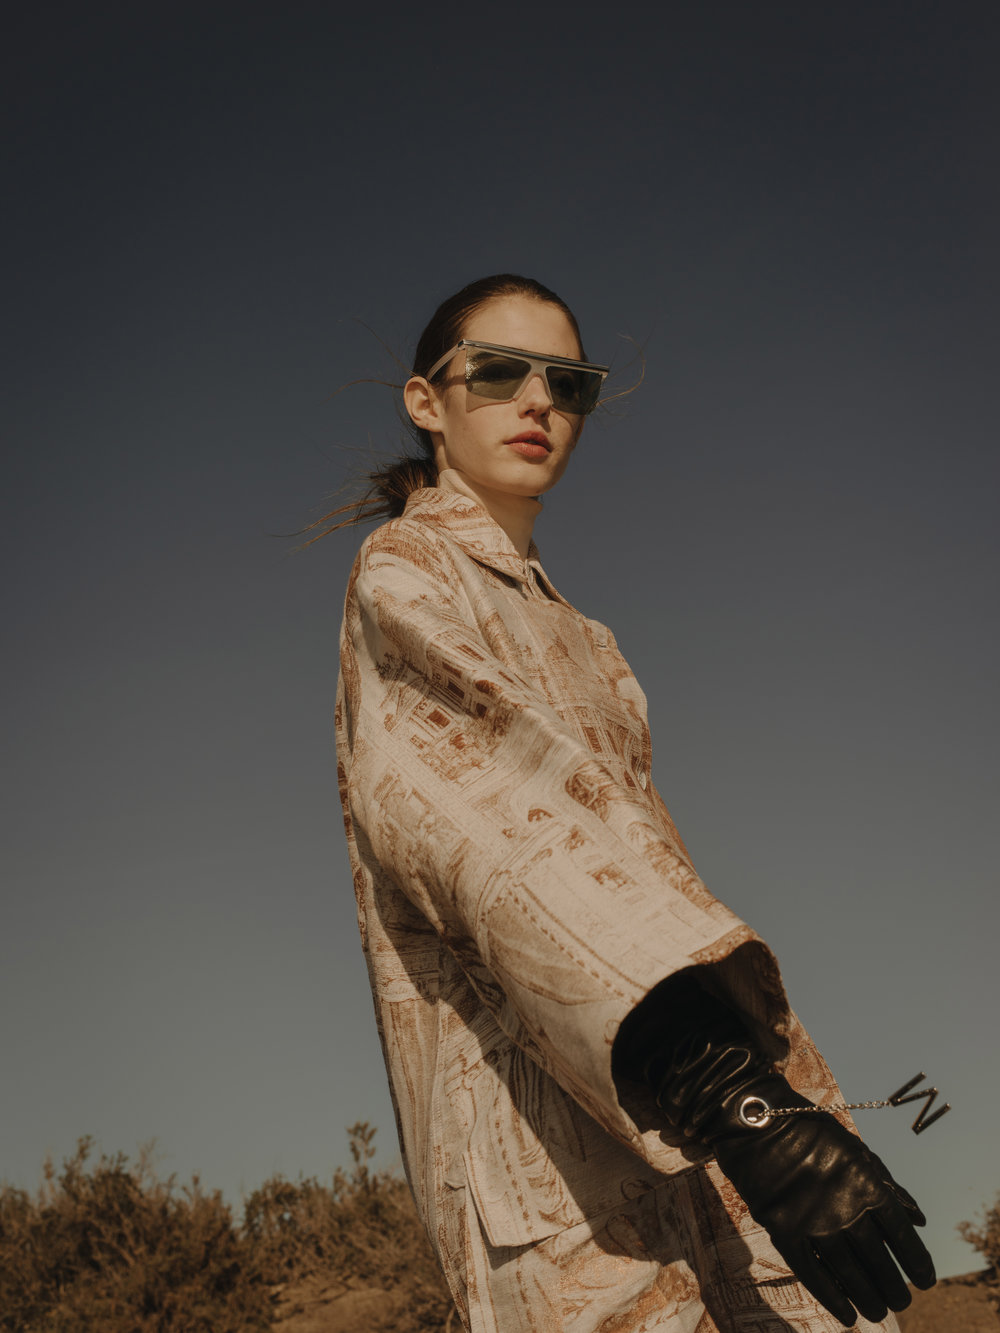 Coat  ACNE STUDIOS    Turtleneck  LANVIN    Gloves  ROUGE MARGOT    Sunglasses  KENZO